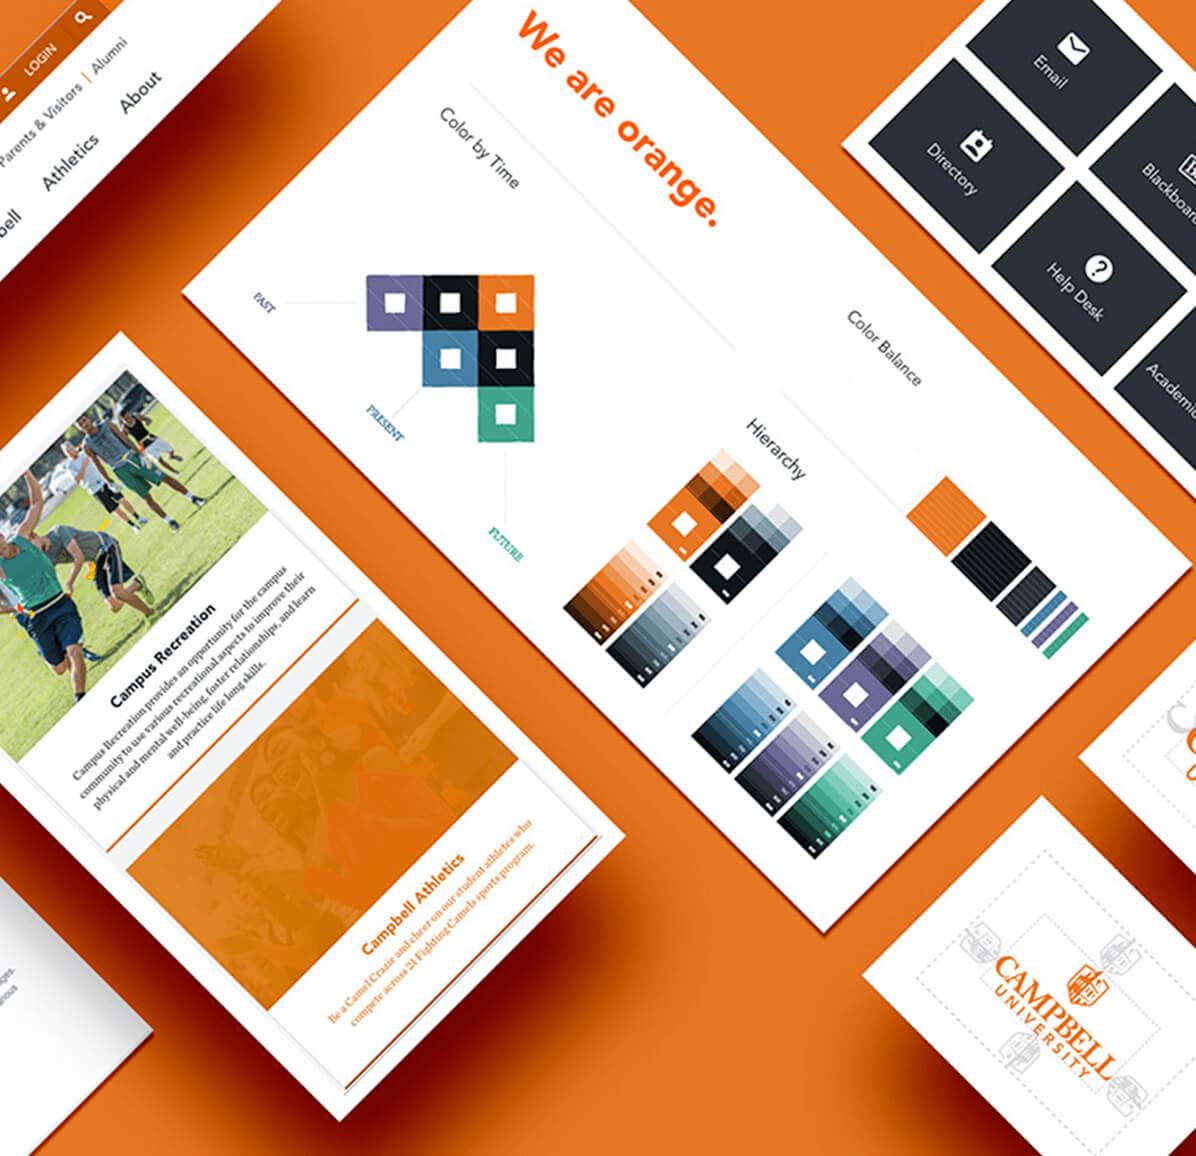 University Web Design Case Study